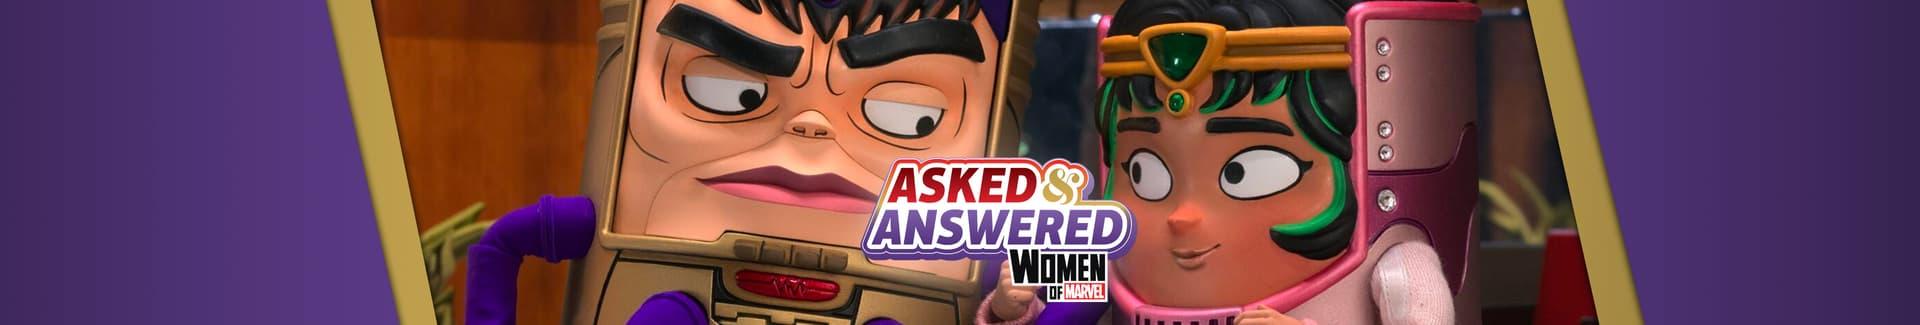 Asked & Answered: 'Marvel's M.O.D.O.K.'